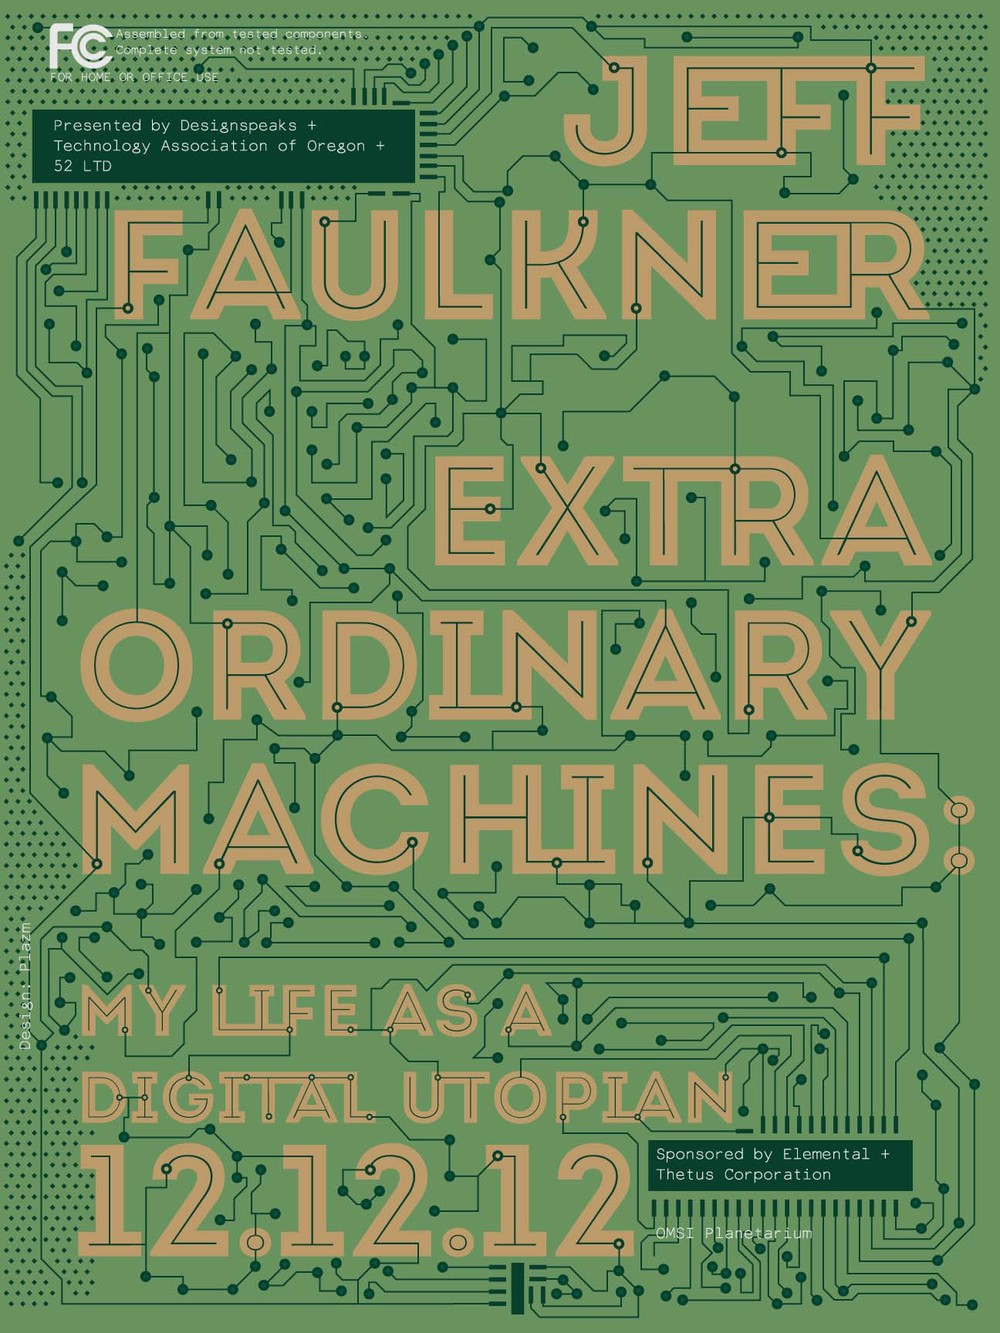 Silkscreen poster, Jeff Faulkner lecture